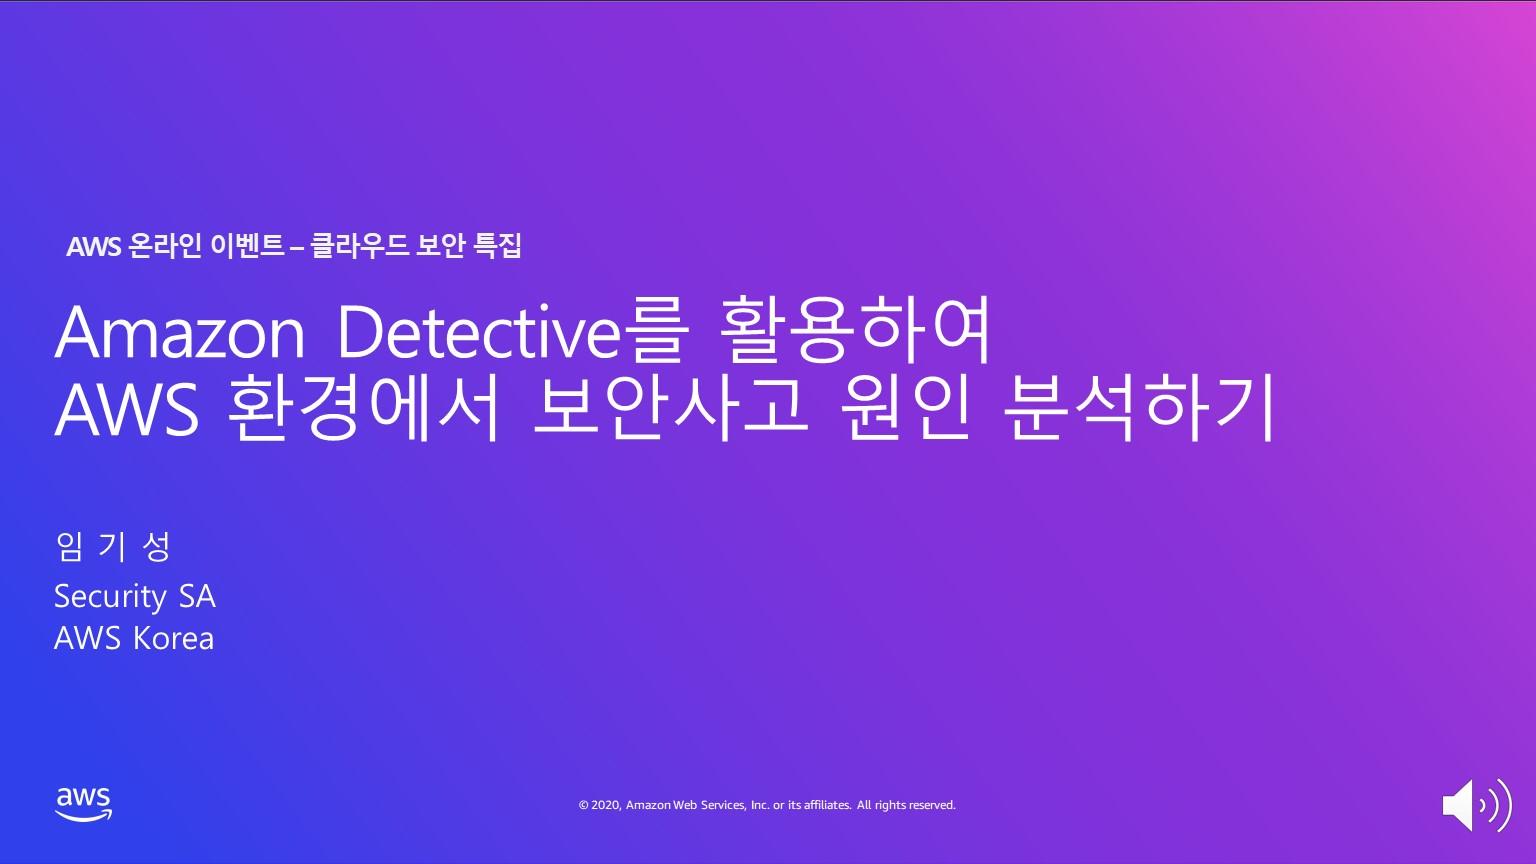 Amazon Detective를 활용하여 AWS 환경에서 보안사고 원인분석하기_임기성